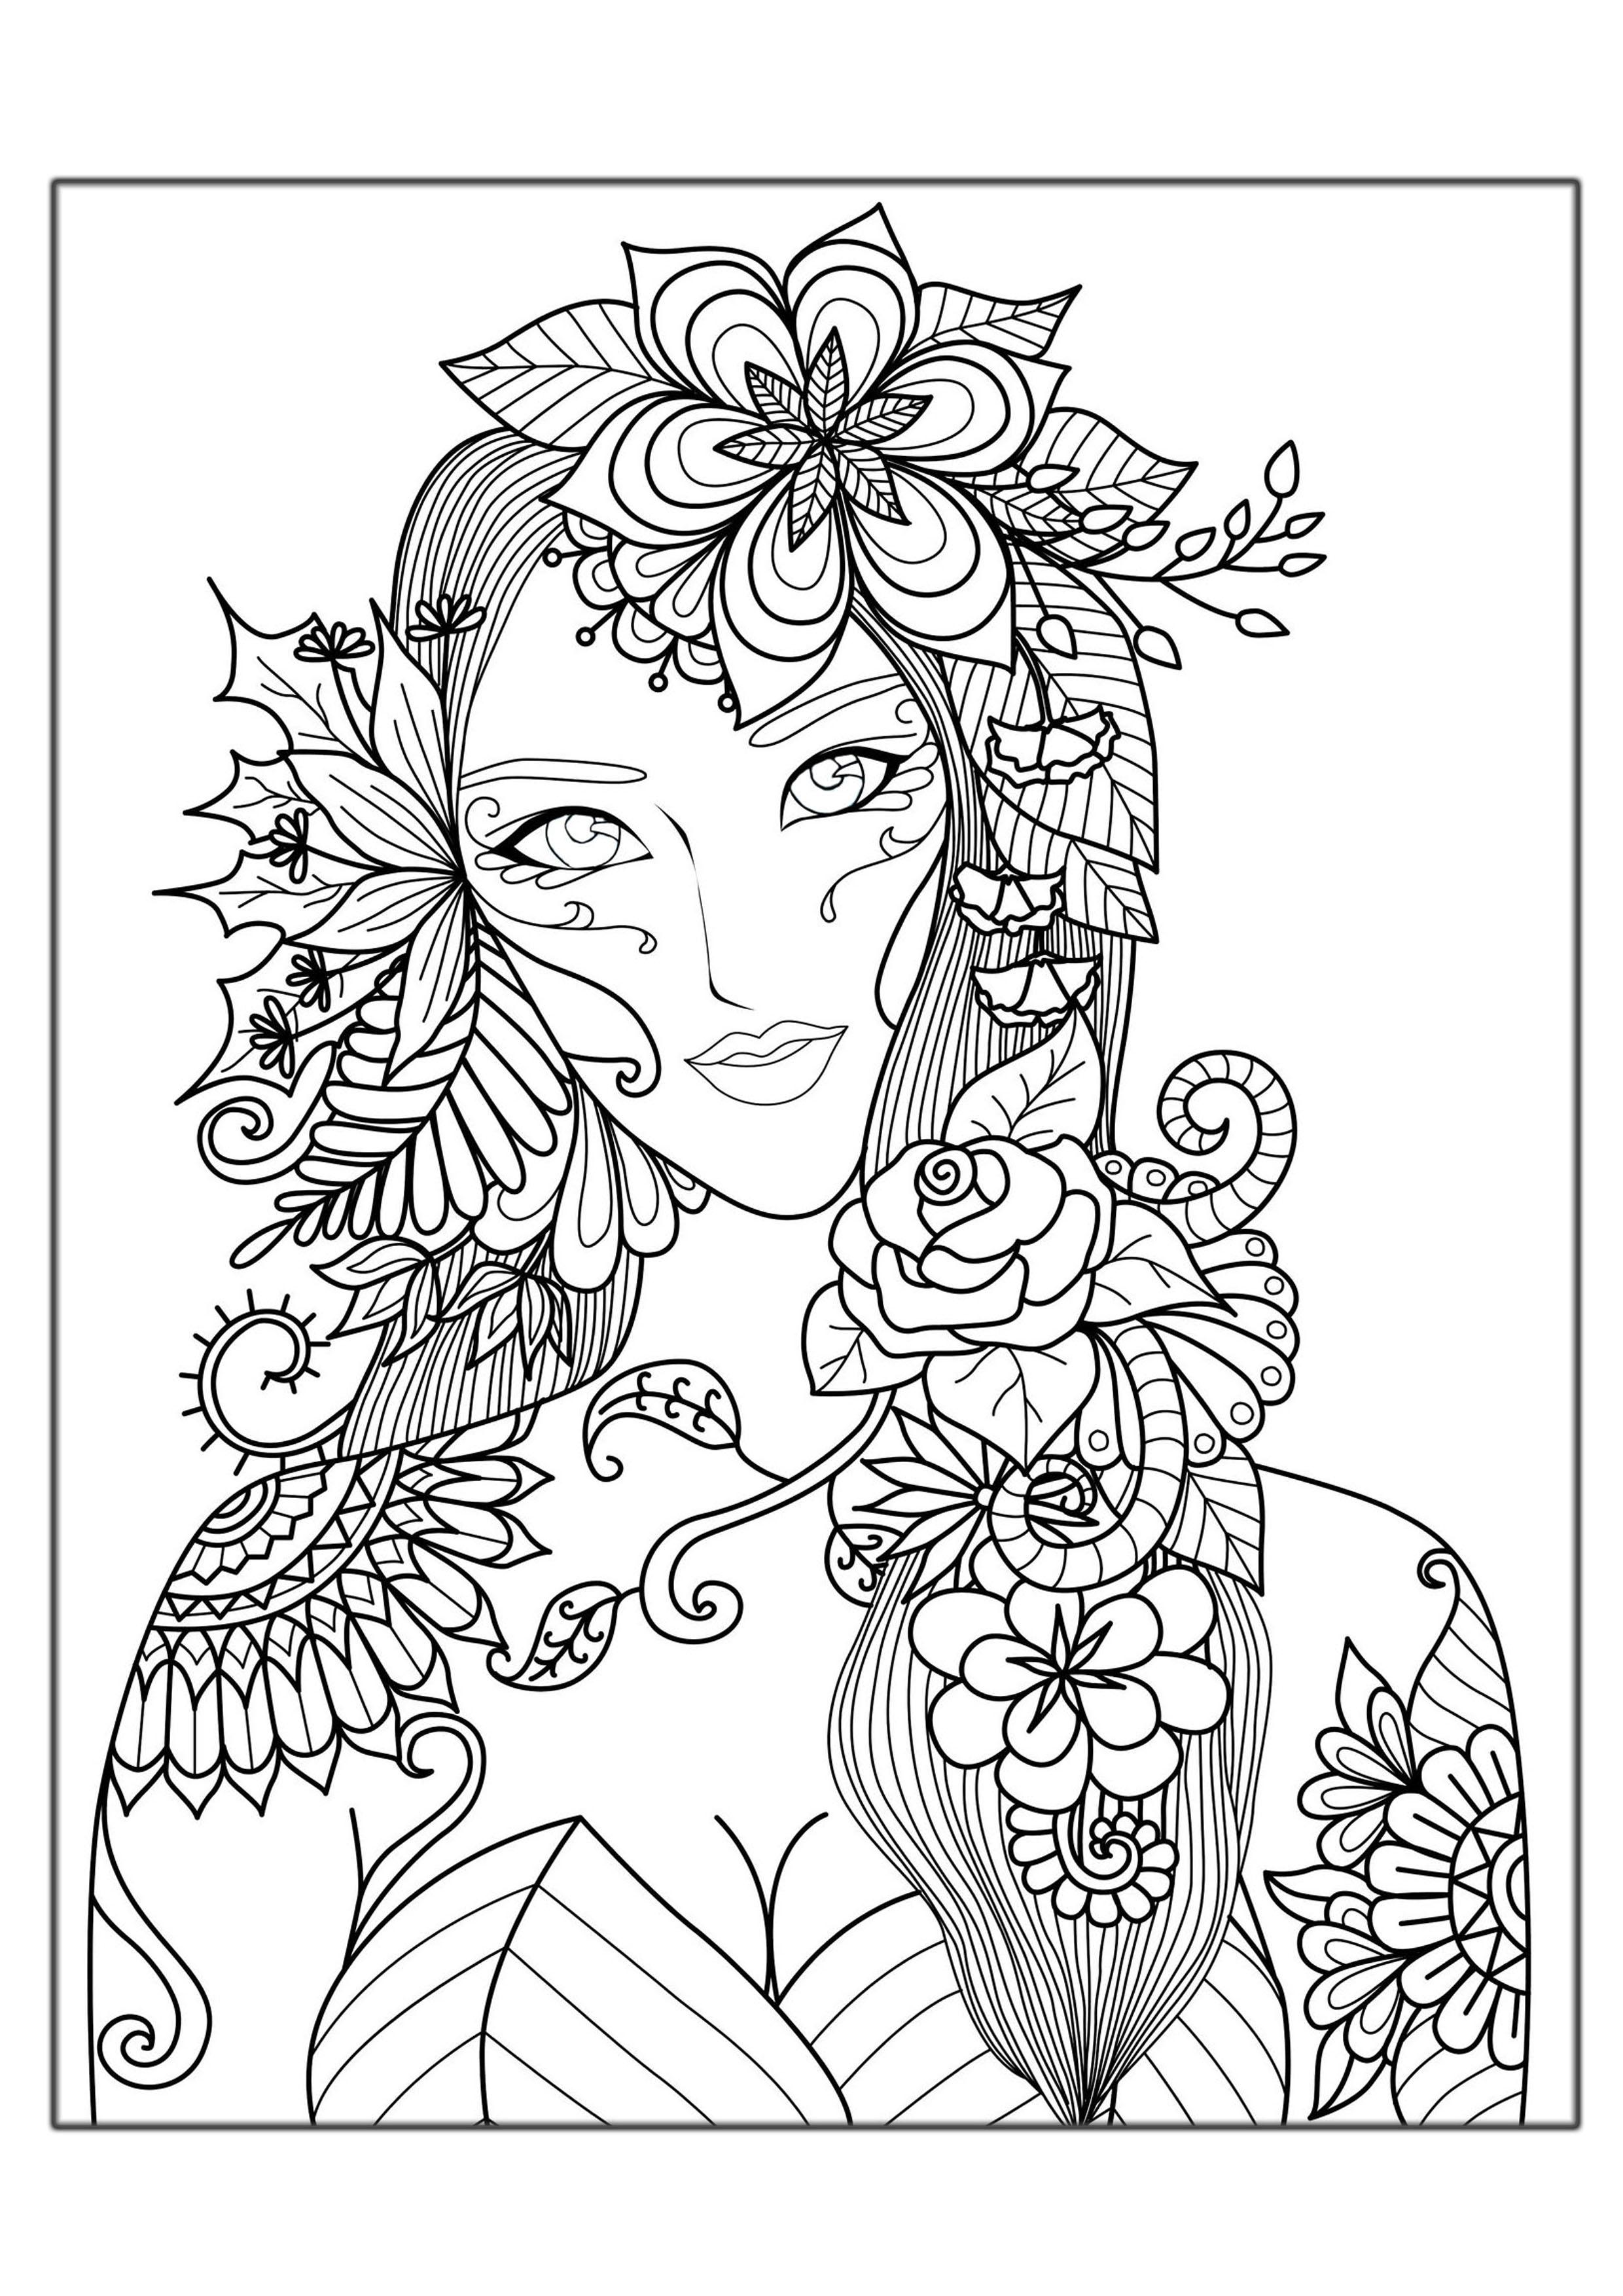 les femmes aiment les fleursa partir de la galerie anti stressartiste bimdeedee